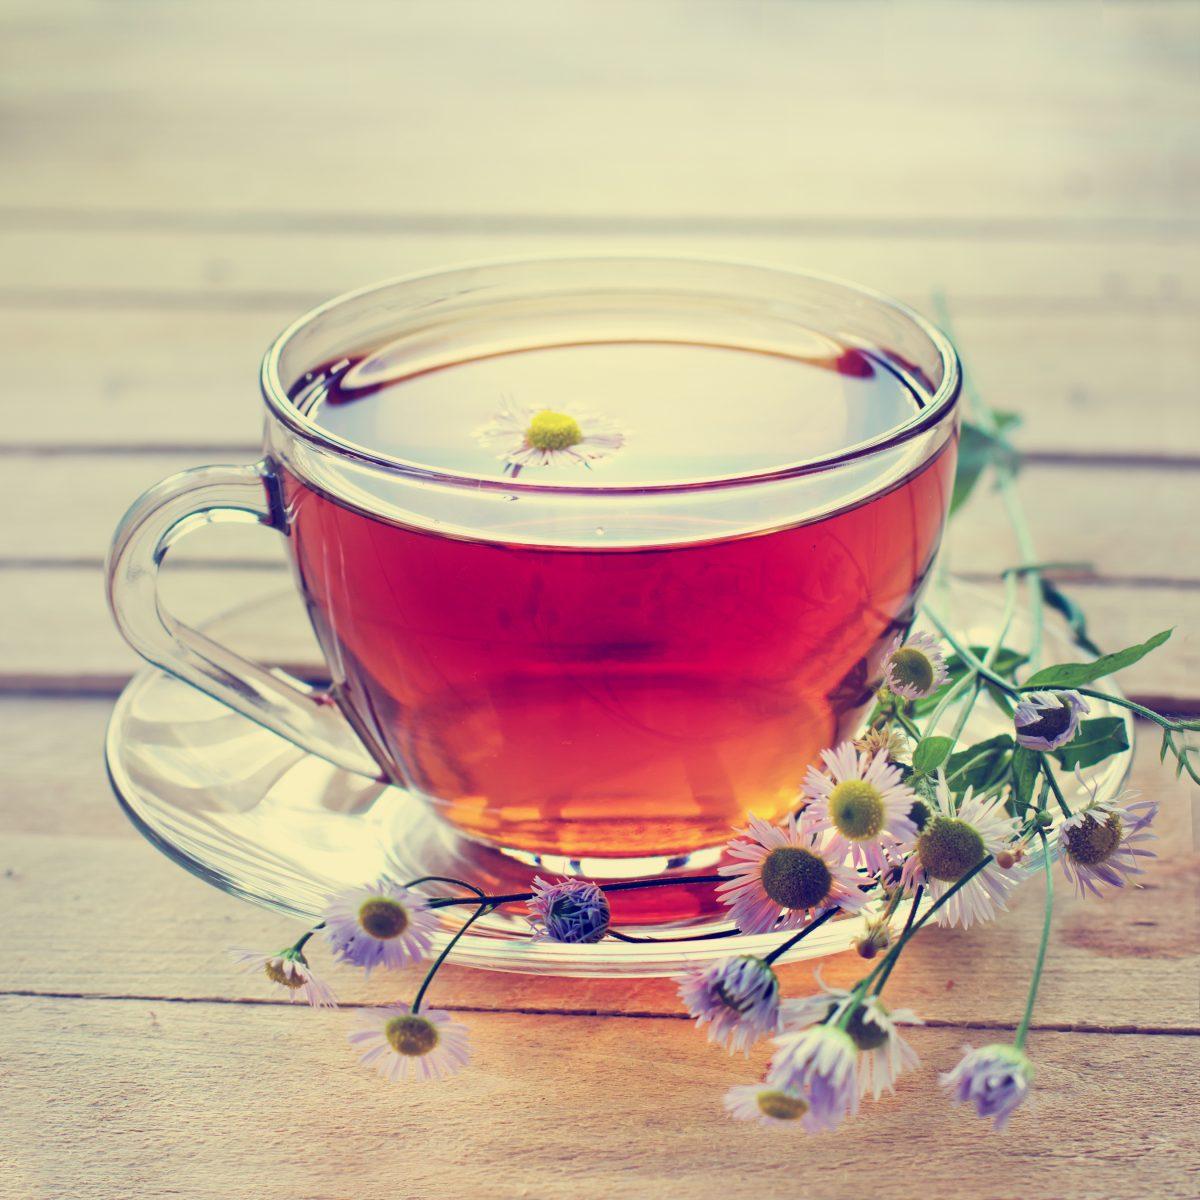 Herbal Supplements For Menopausal Symptoms